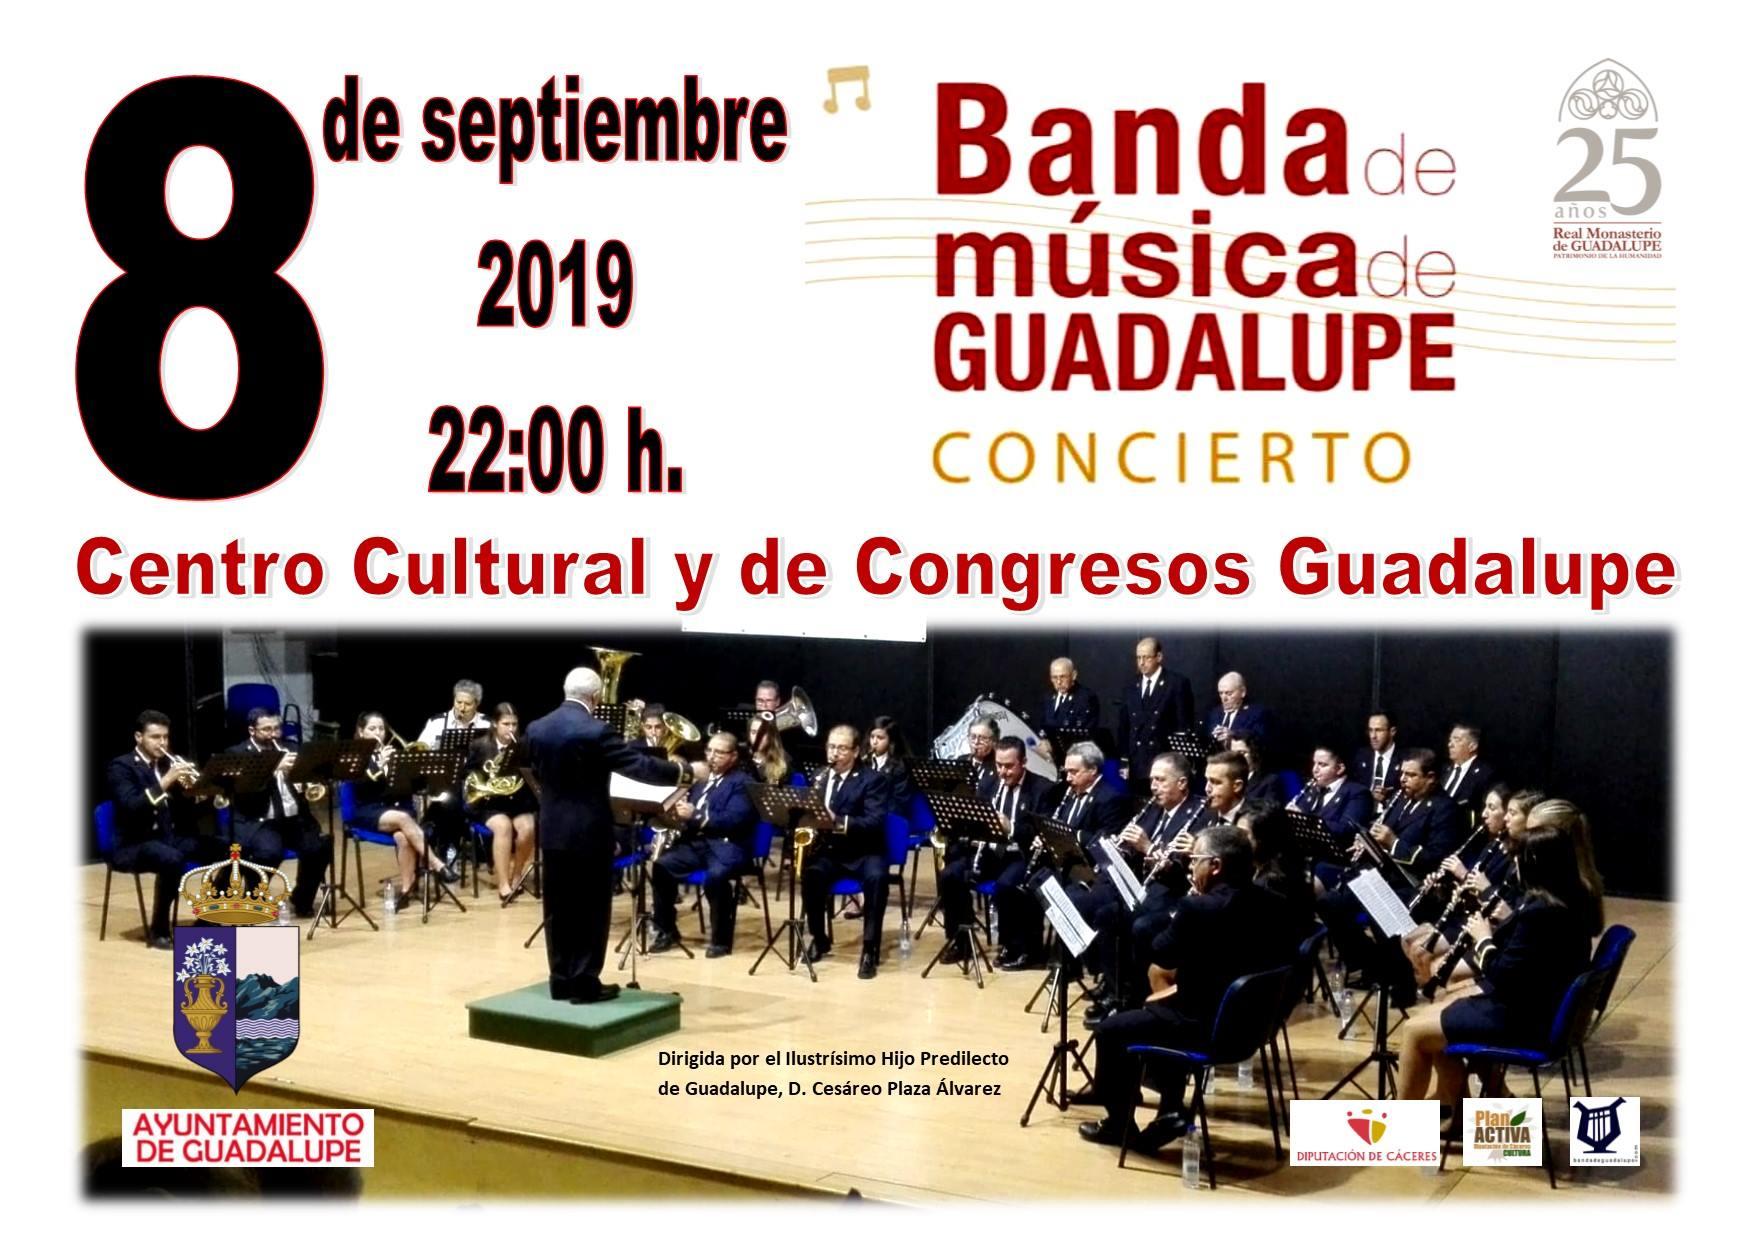 Concierto de la banda de música de Guadalupe 2019 - Guadalupe (Cáceres)